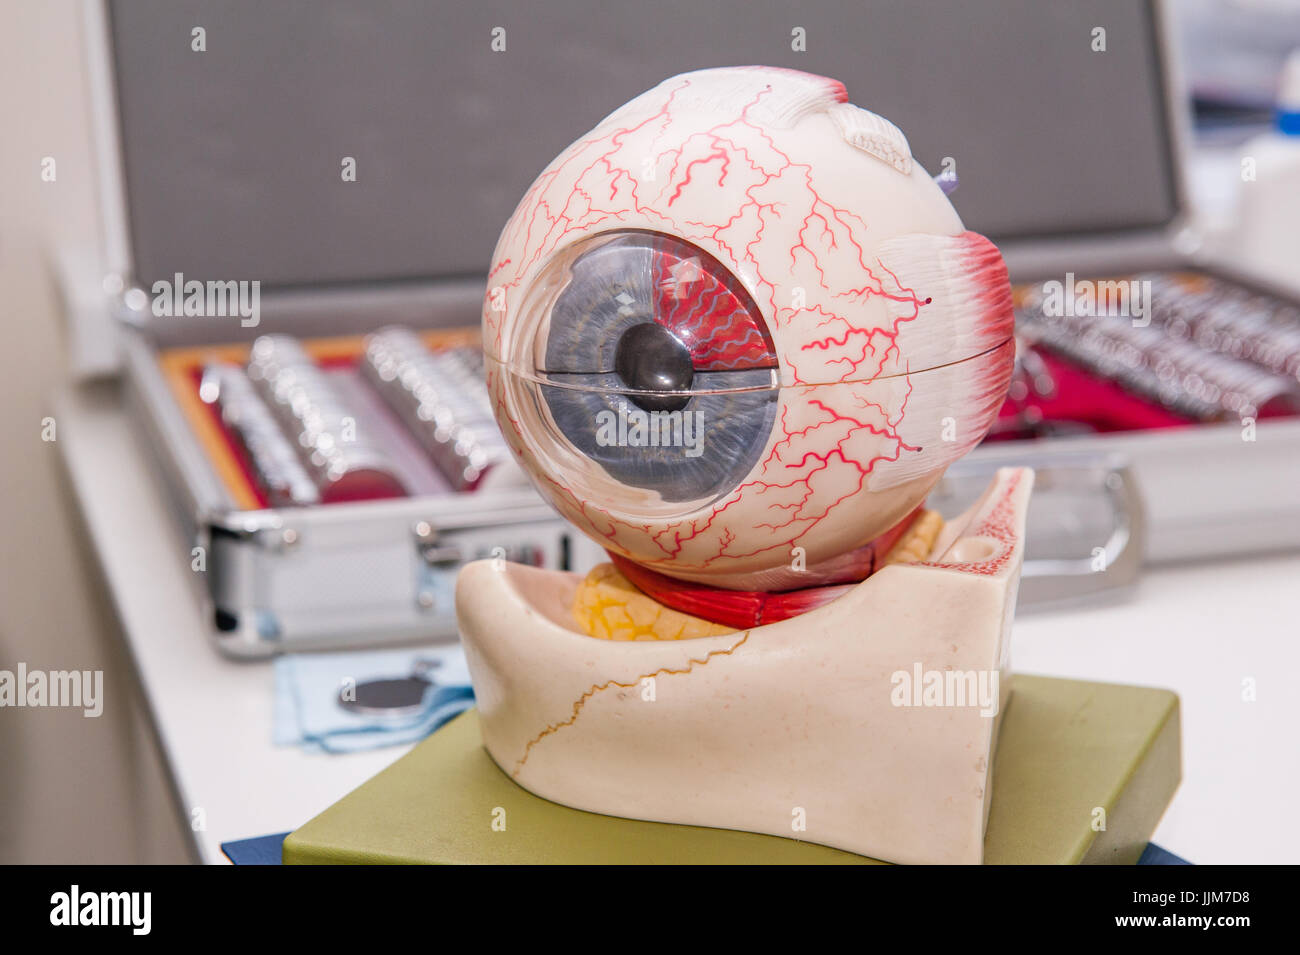 Human eye anatomy model on the background of set of corrective lens ...